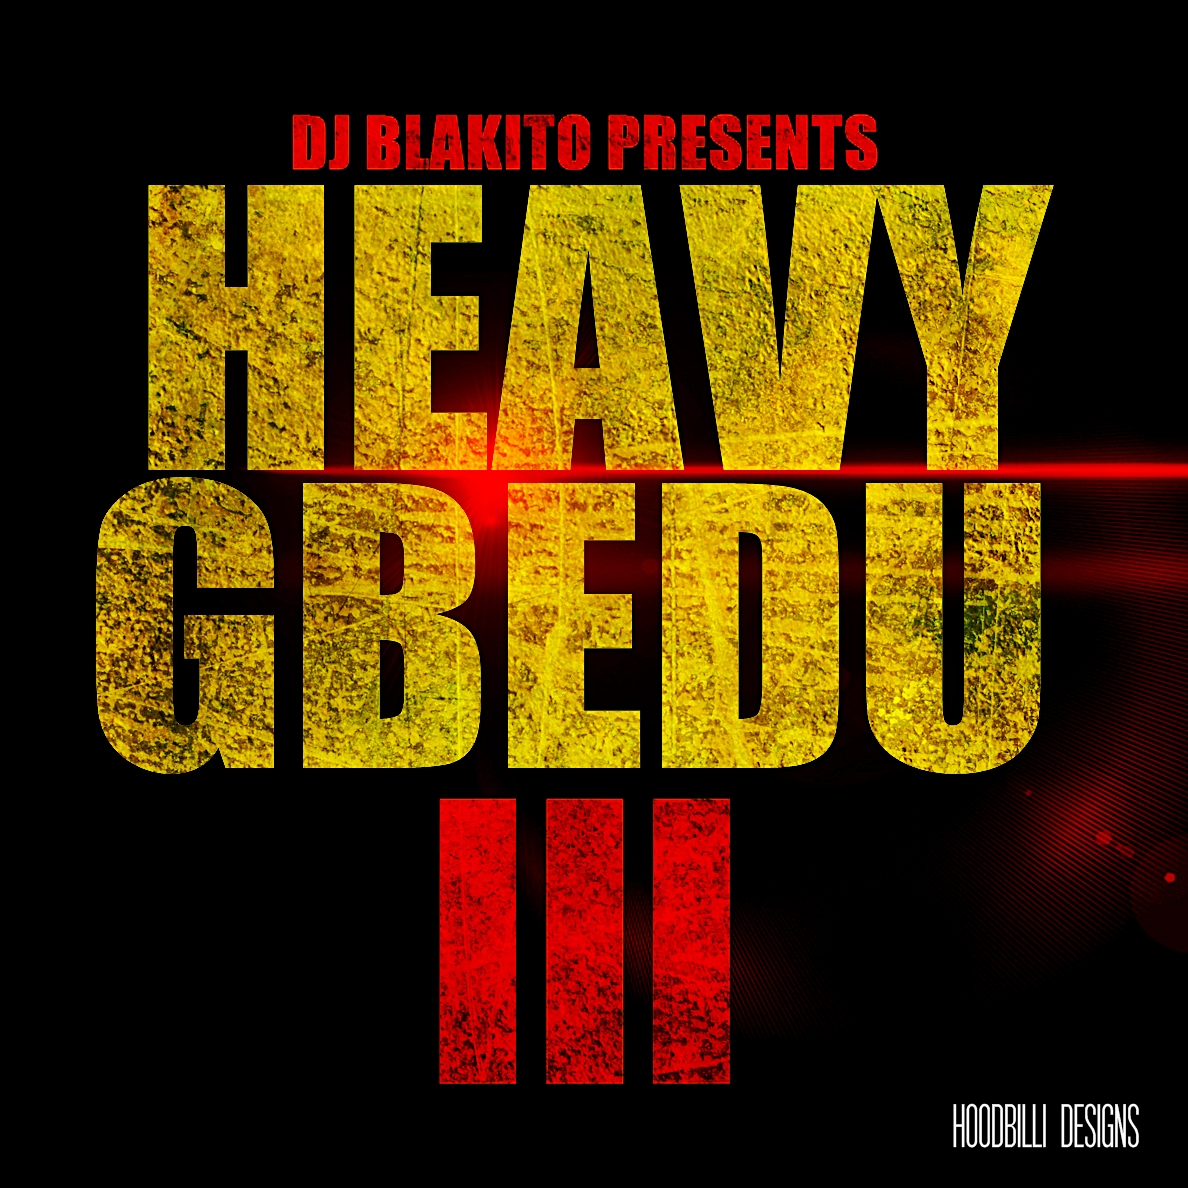 Dj Blakito - Heavy Gbedu 3 FRONT | AceWorldTeam.com